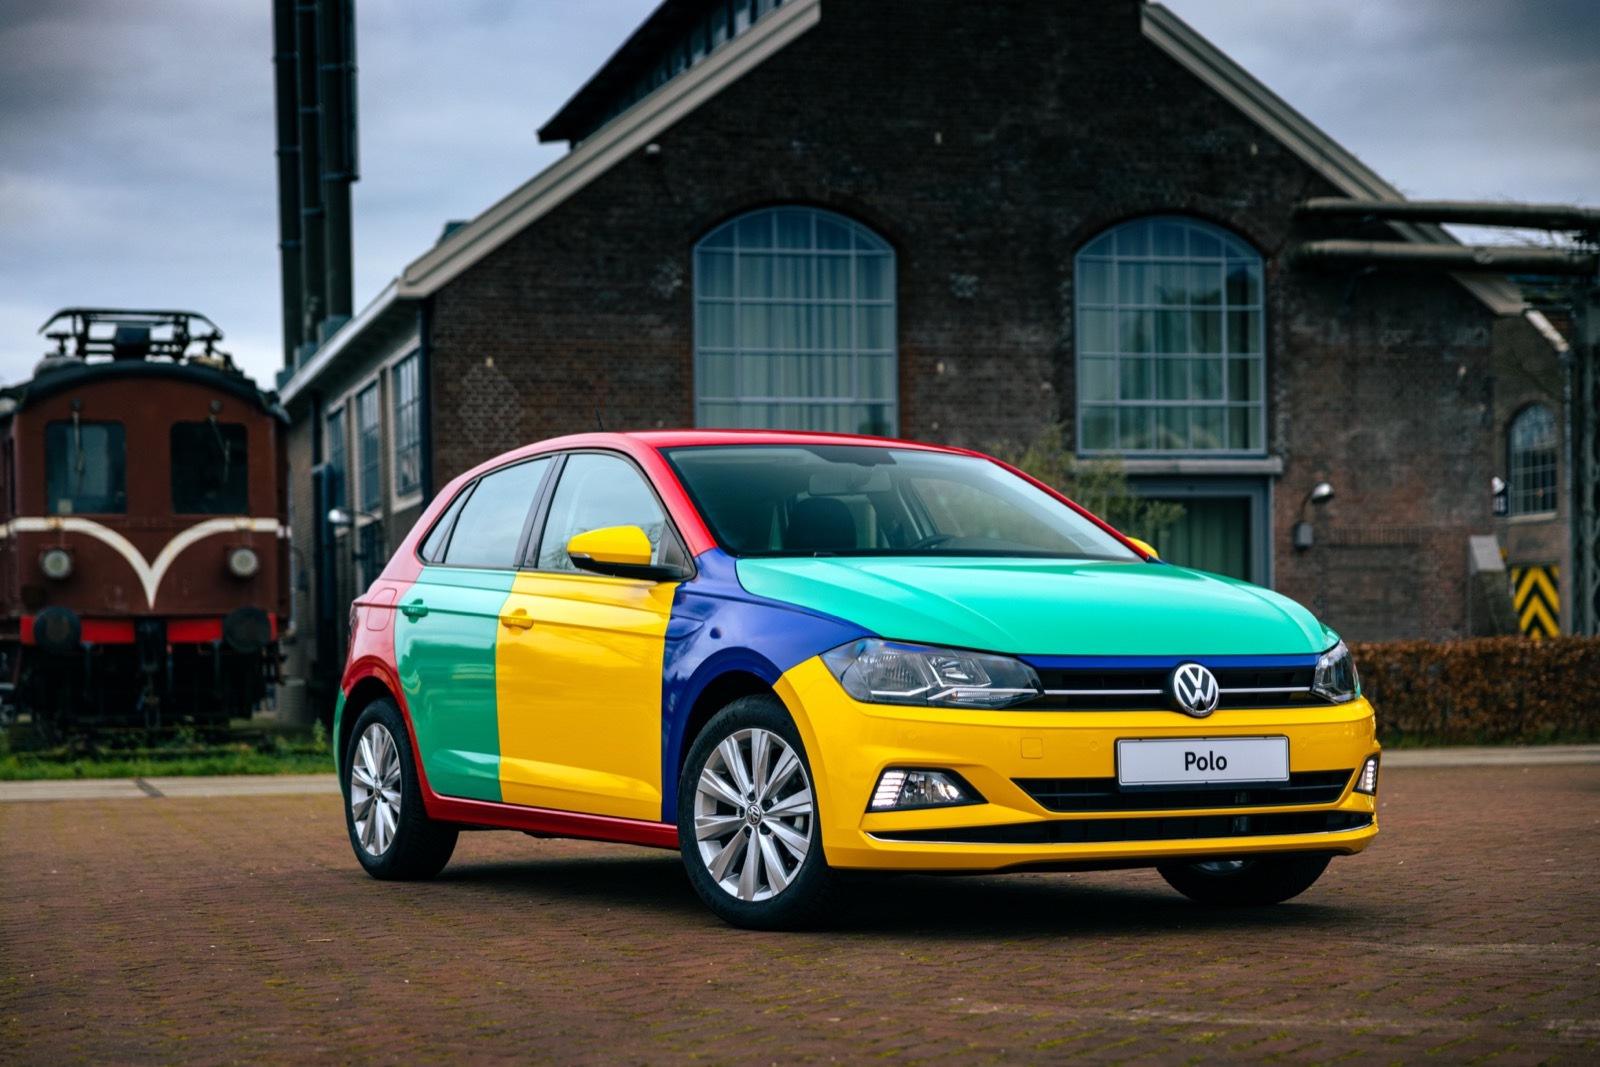 Volkswagen_Netherlands_modern_Polo_Harlekin_0013